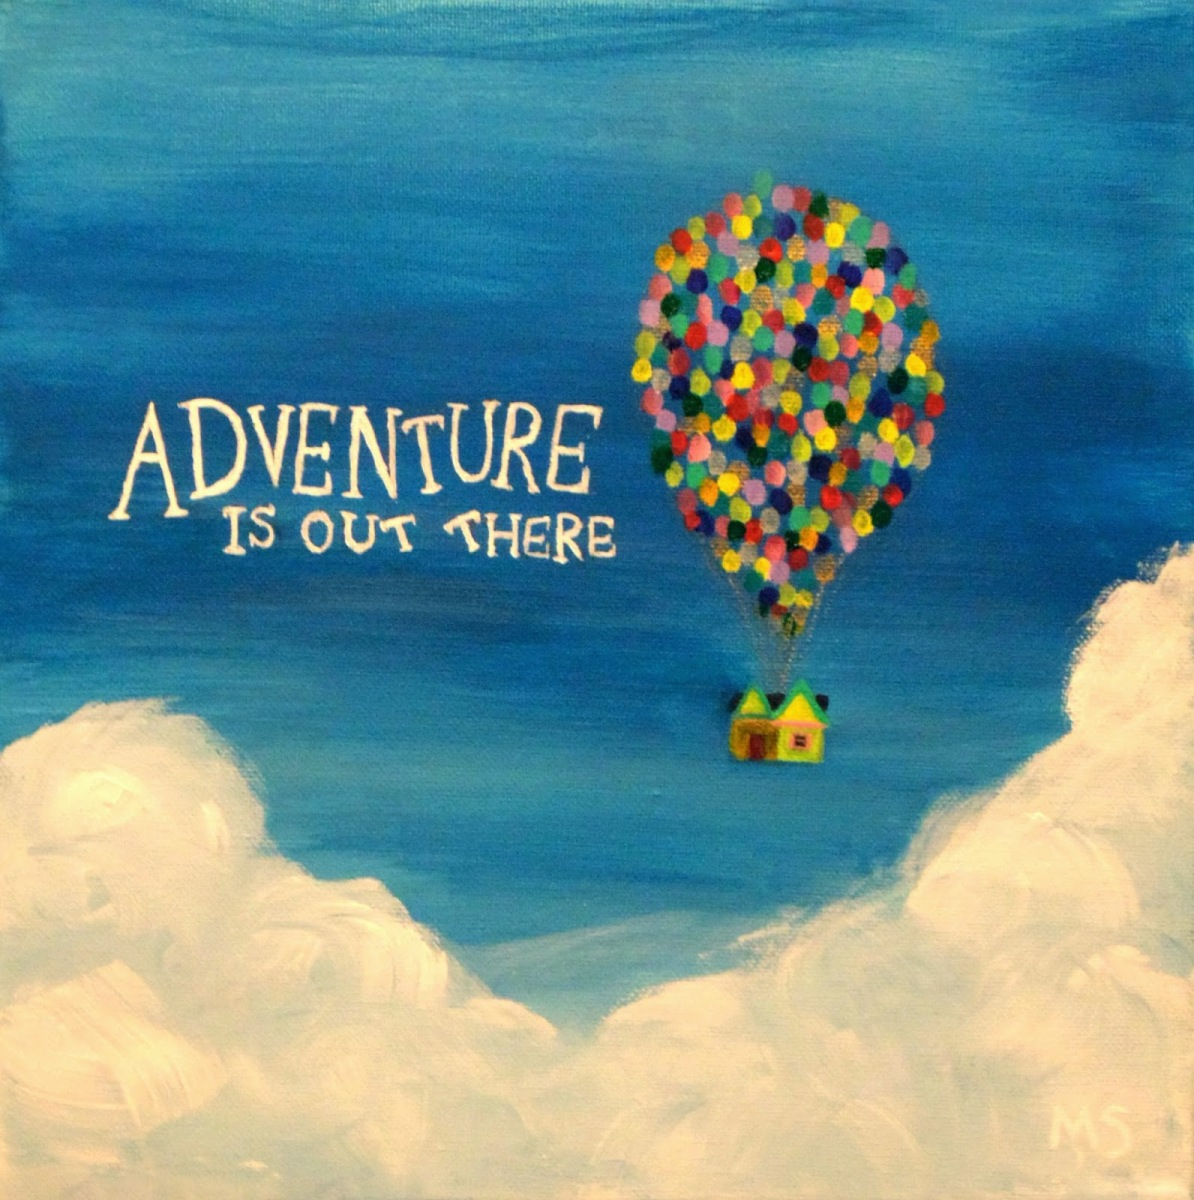 La aventura nos aguarda